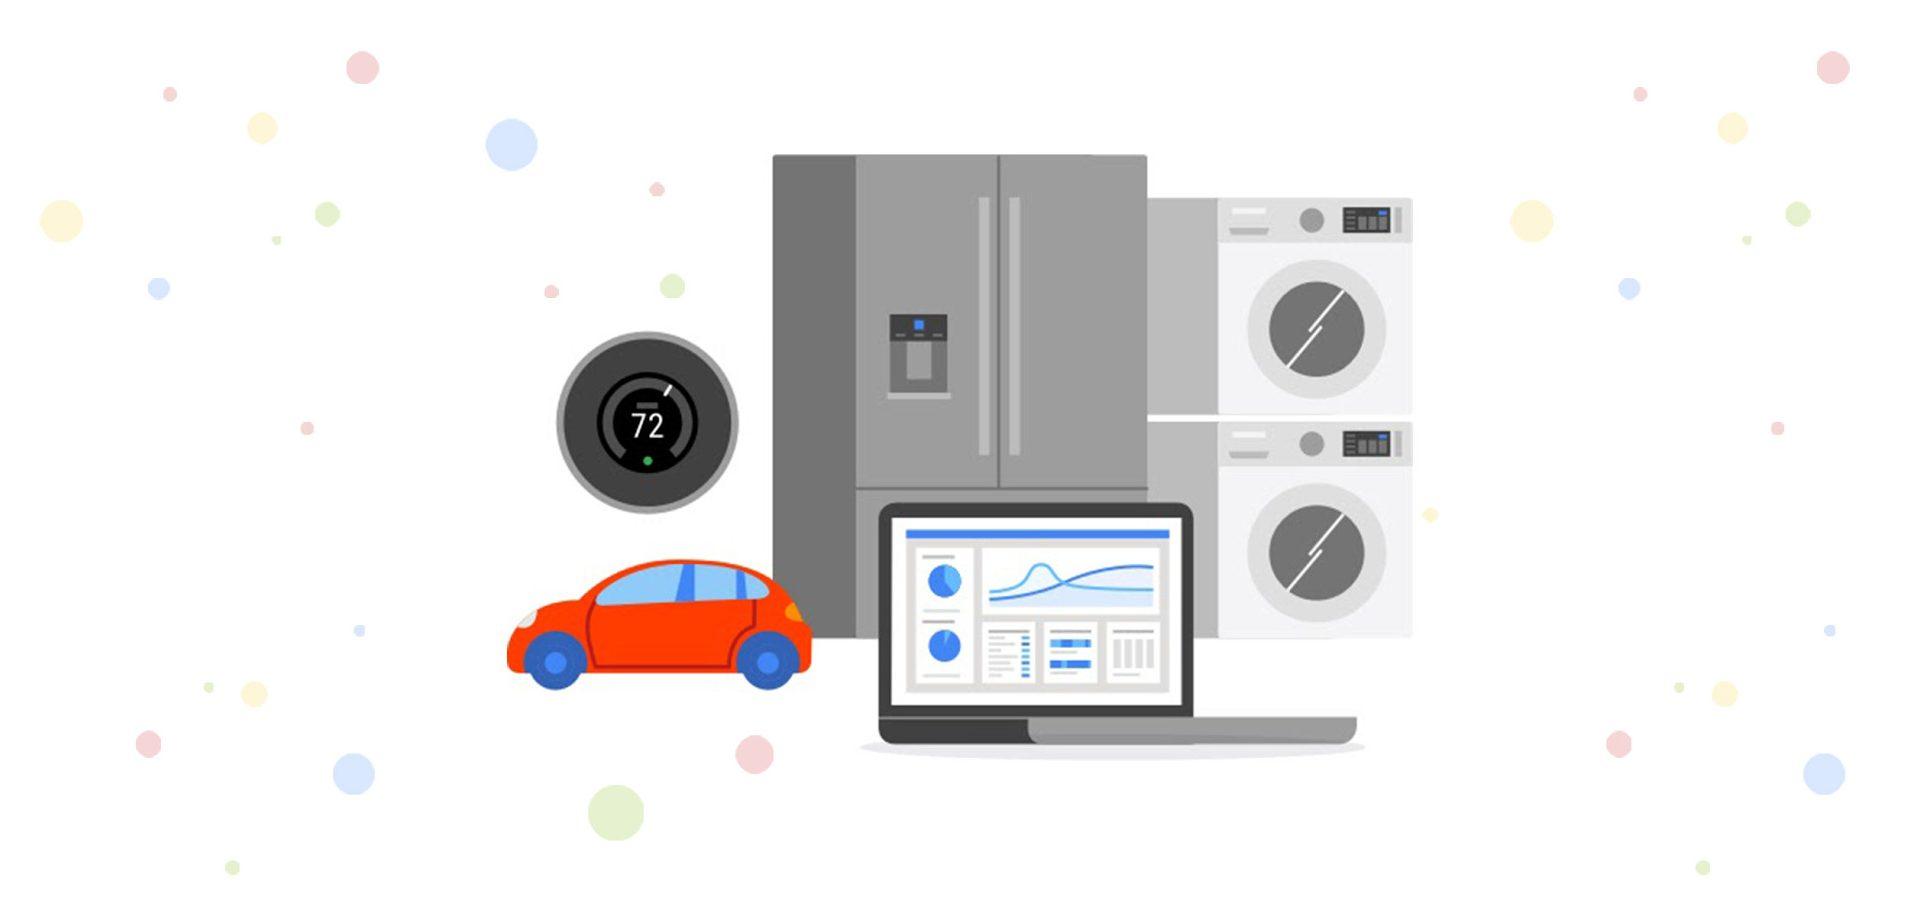 Google Cloud   IoT   Car, Smart Ref, Laptop, Dashboard